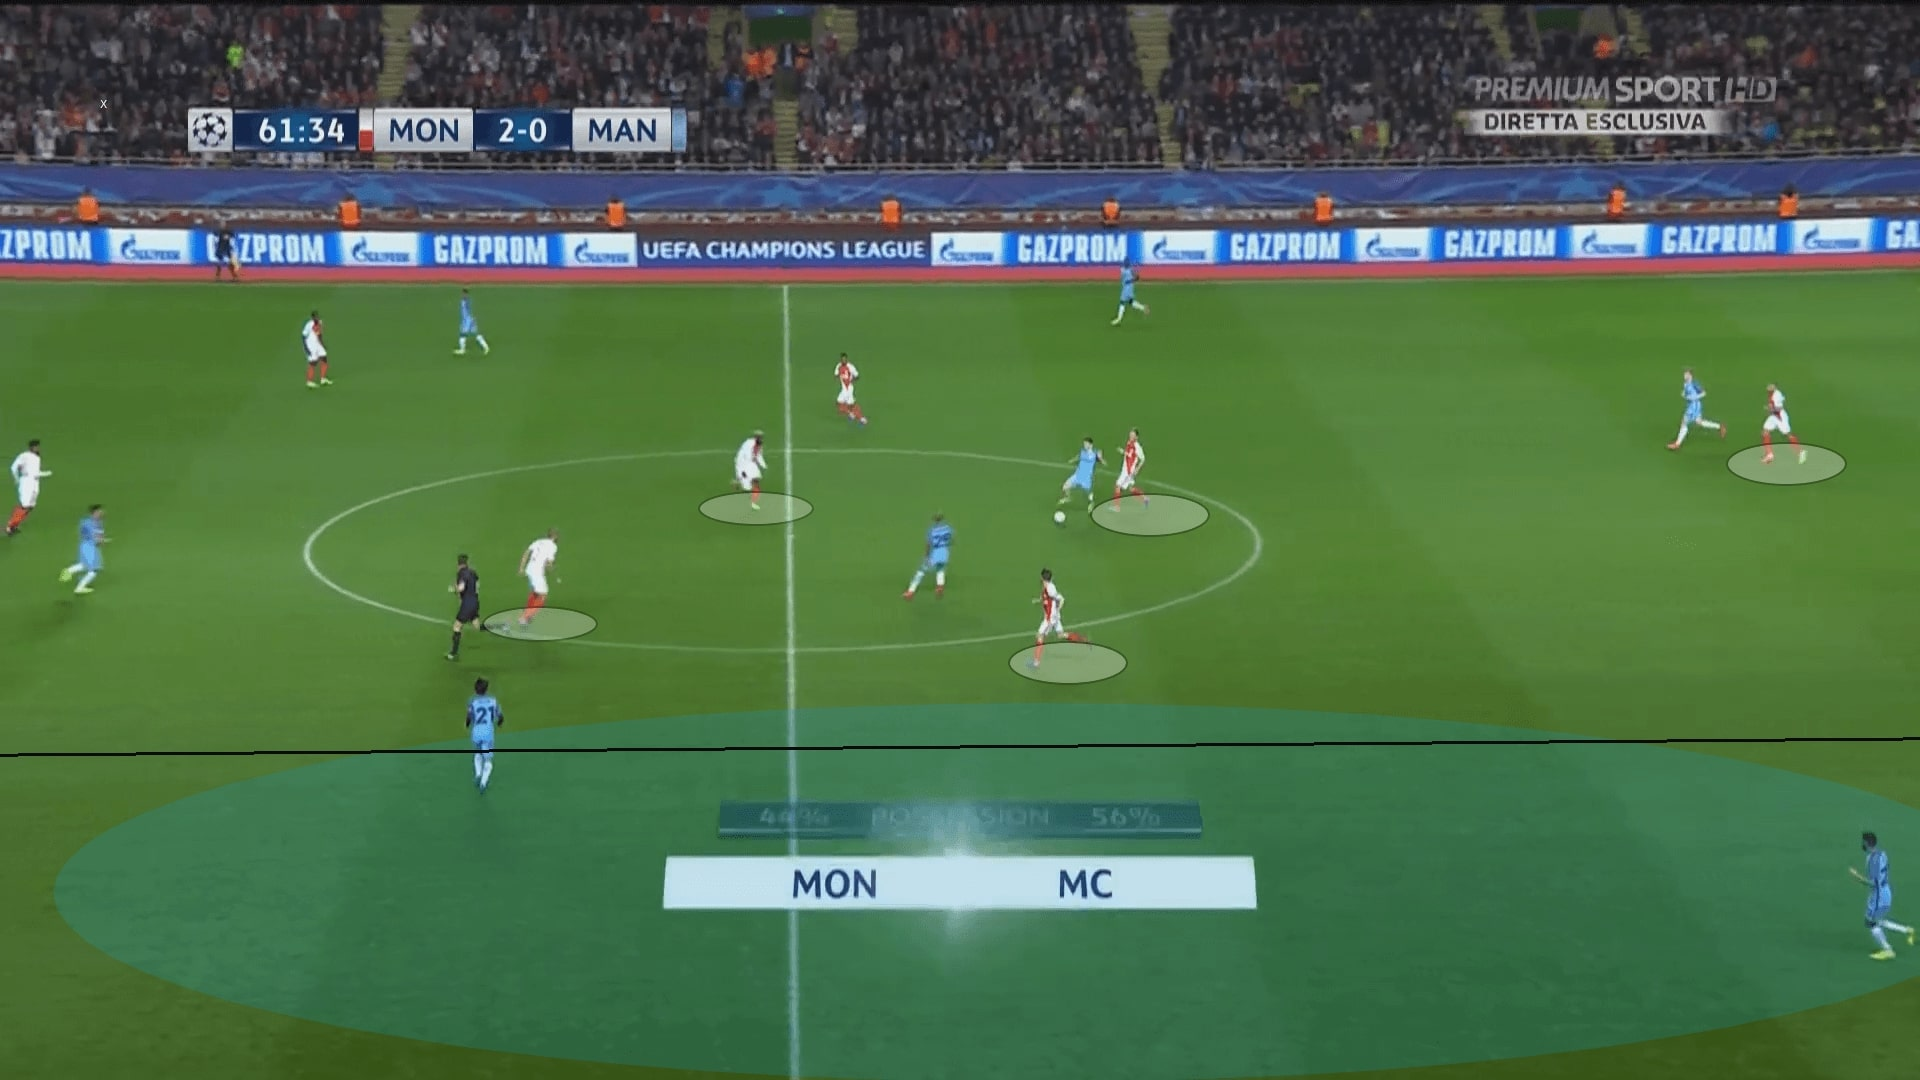 UEFA Champions League 2016/17: Monaco vs Manchester City - tactical analysis tactics